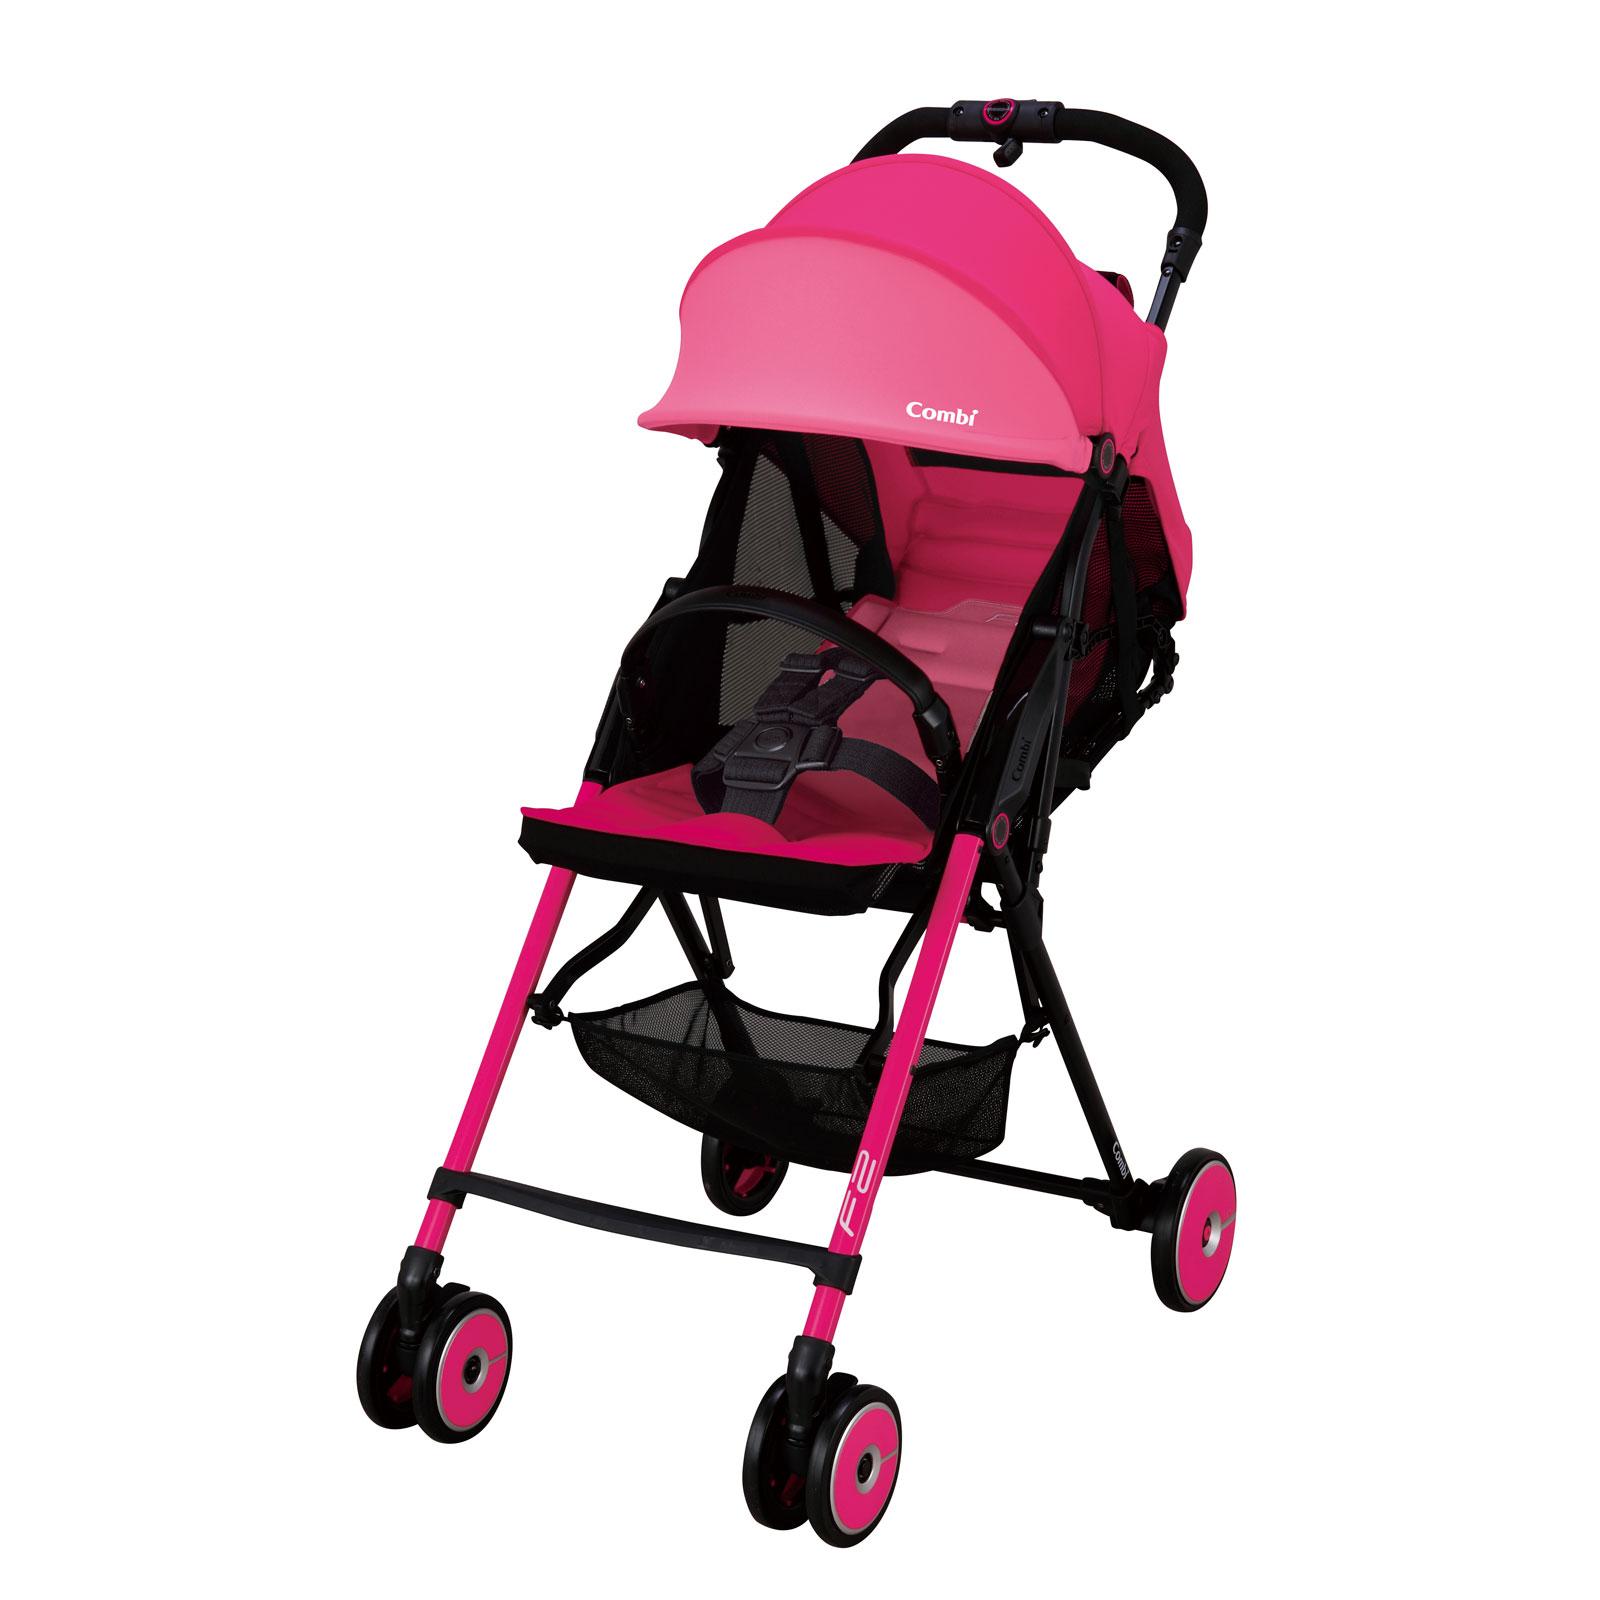 Коляска Combi F2 Plus Model 2016 Розовый<br>